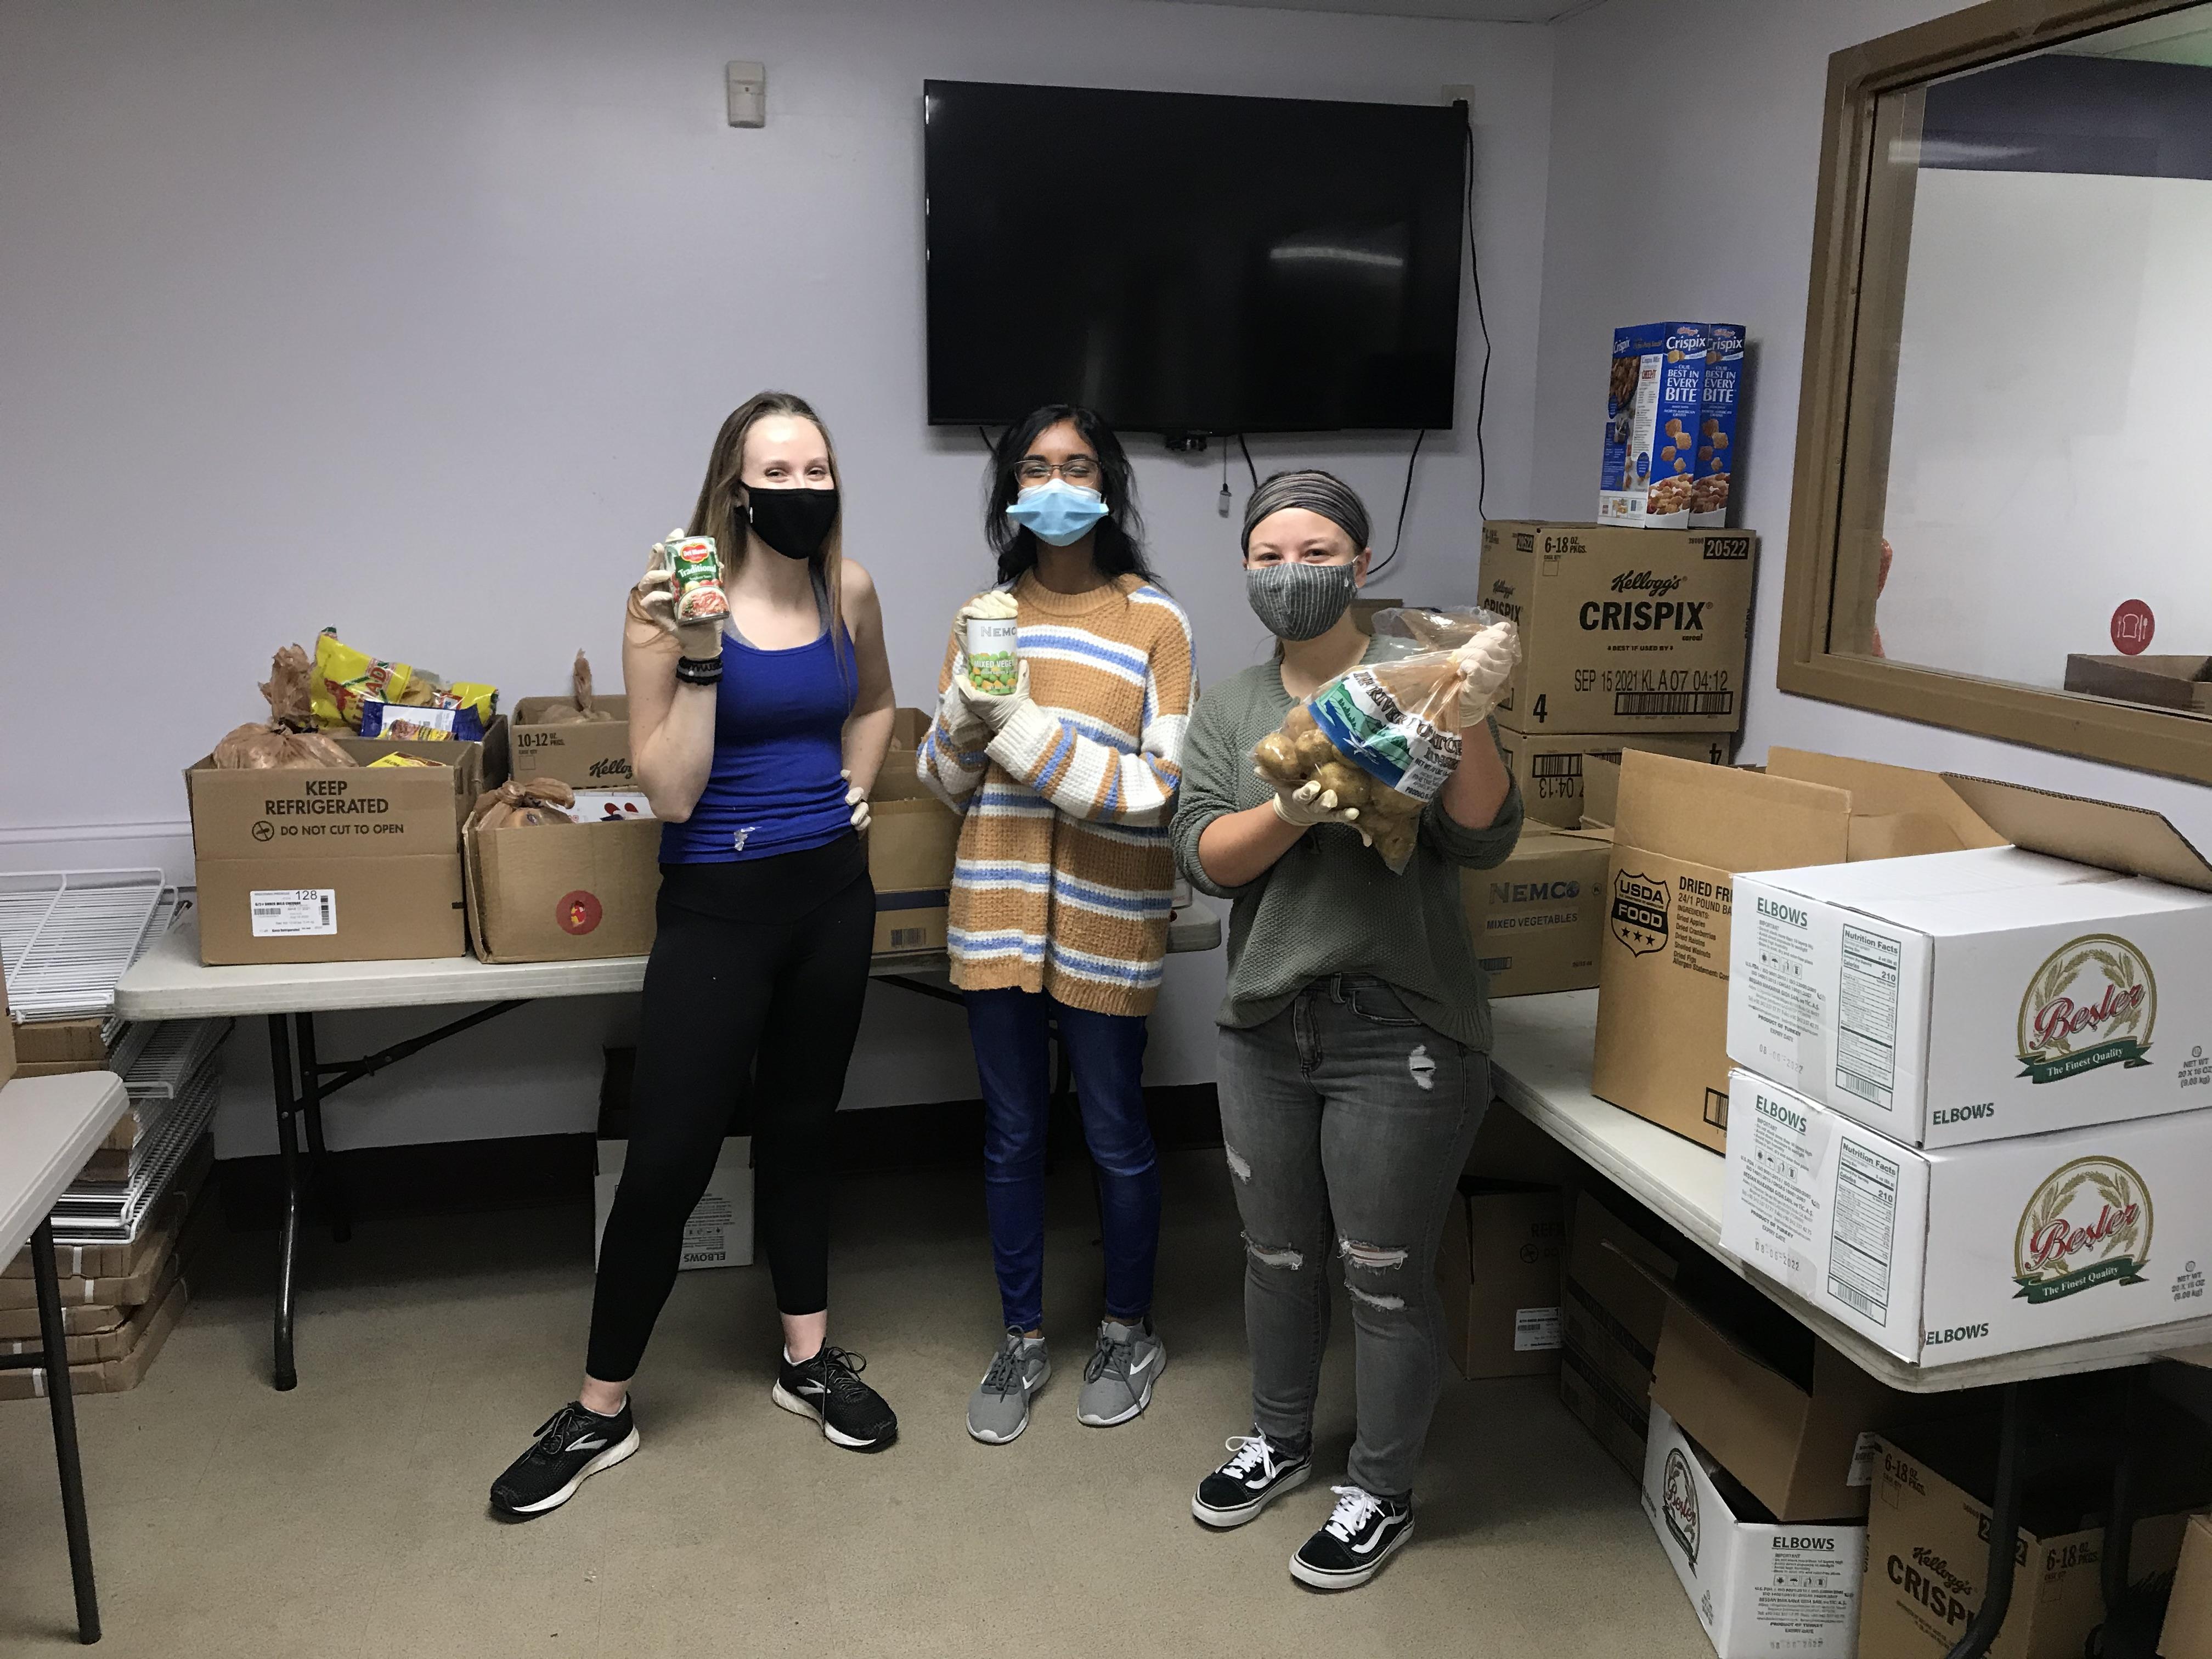 Students volunteering at a food pantry